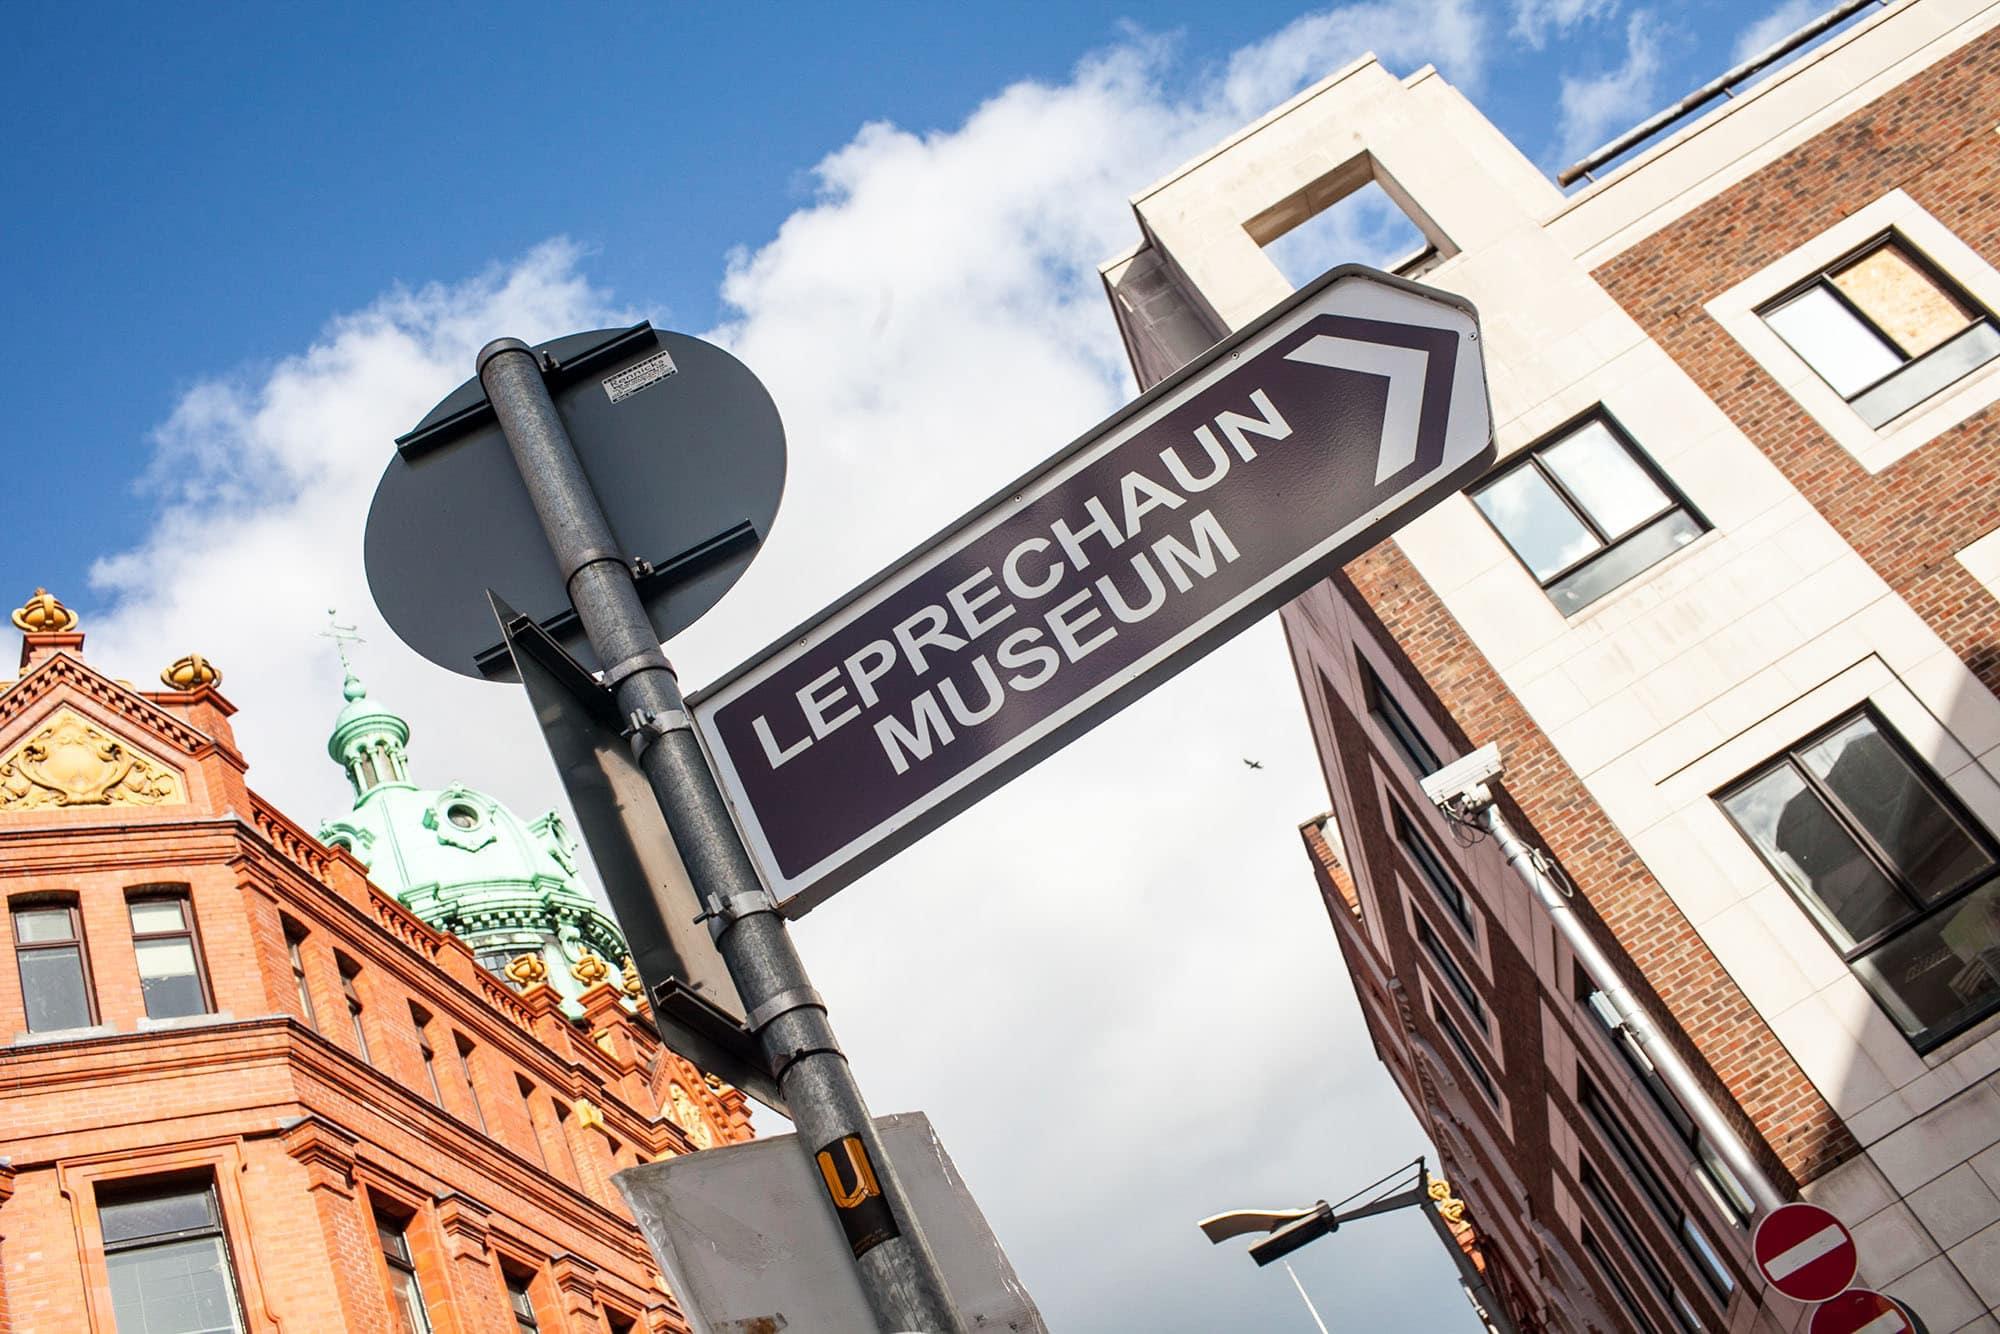 National Leprechaun Museum in Dublin, Ireland